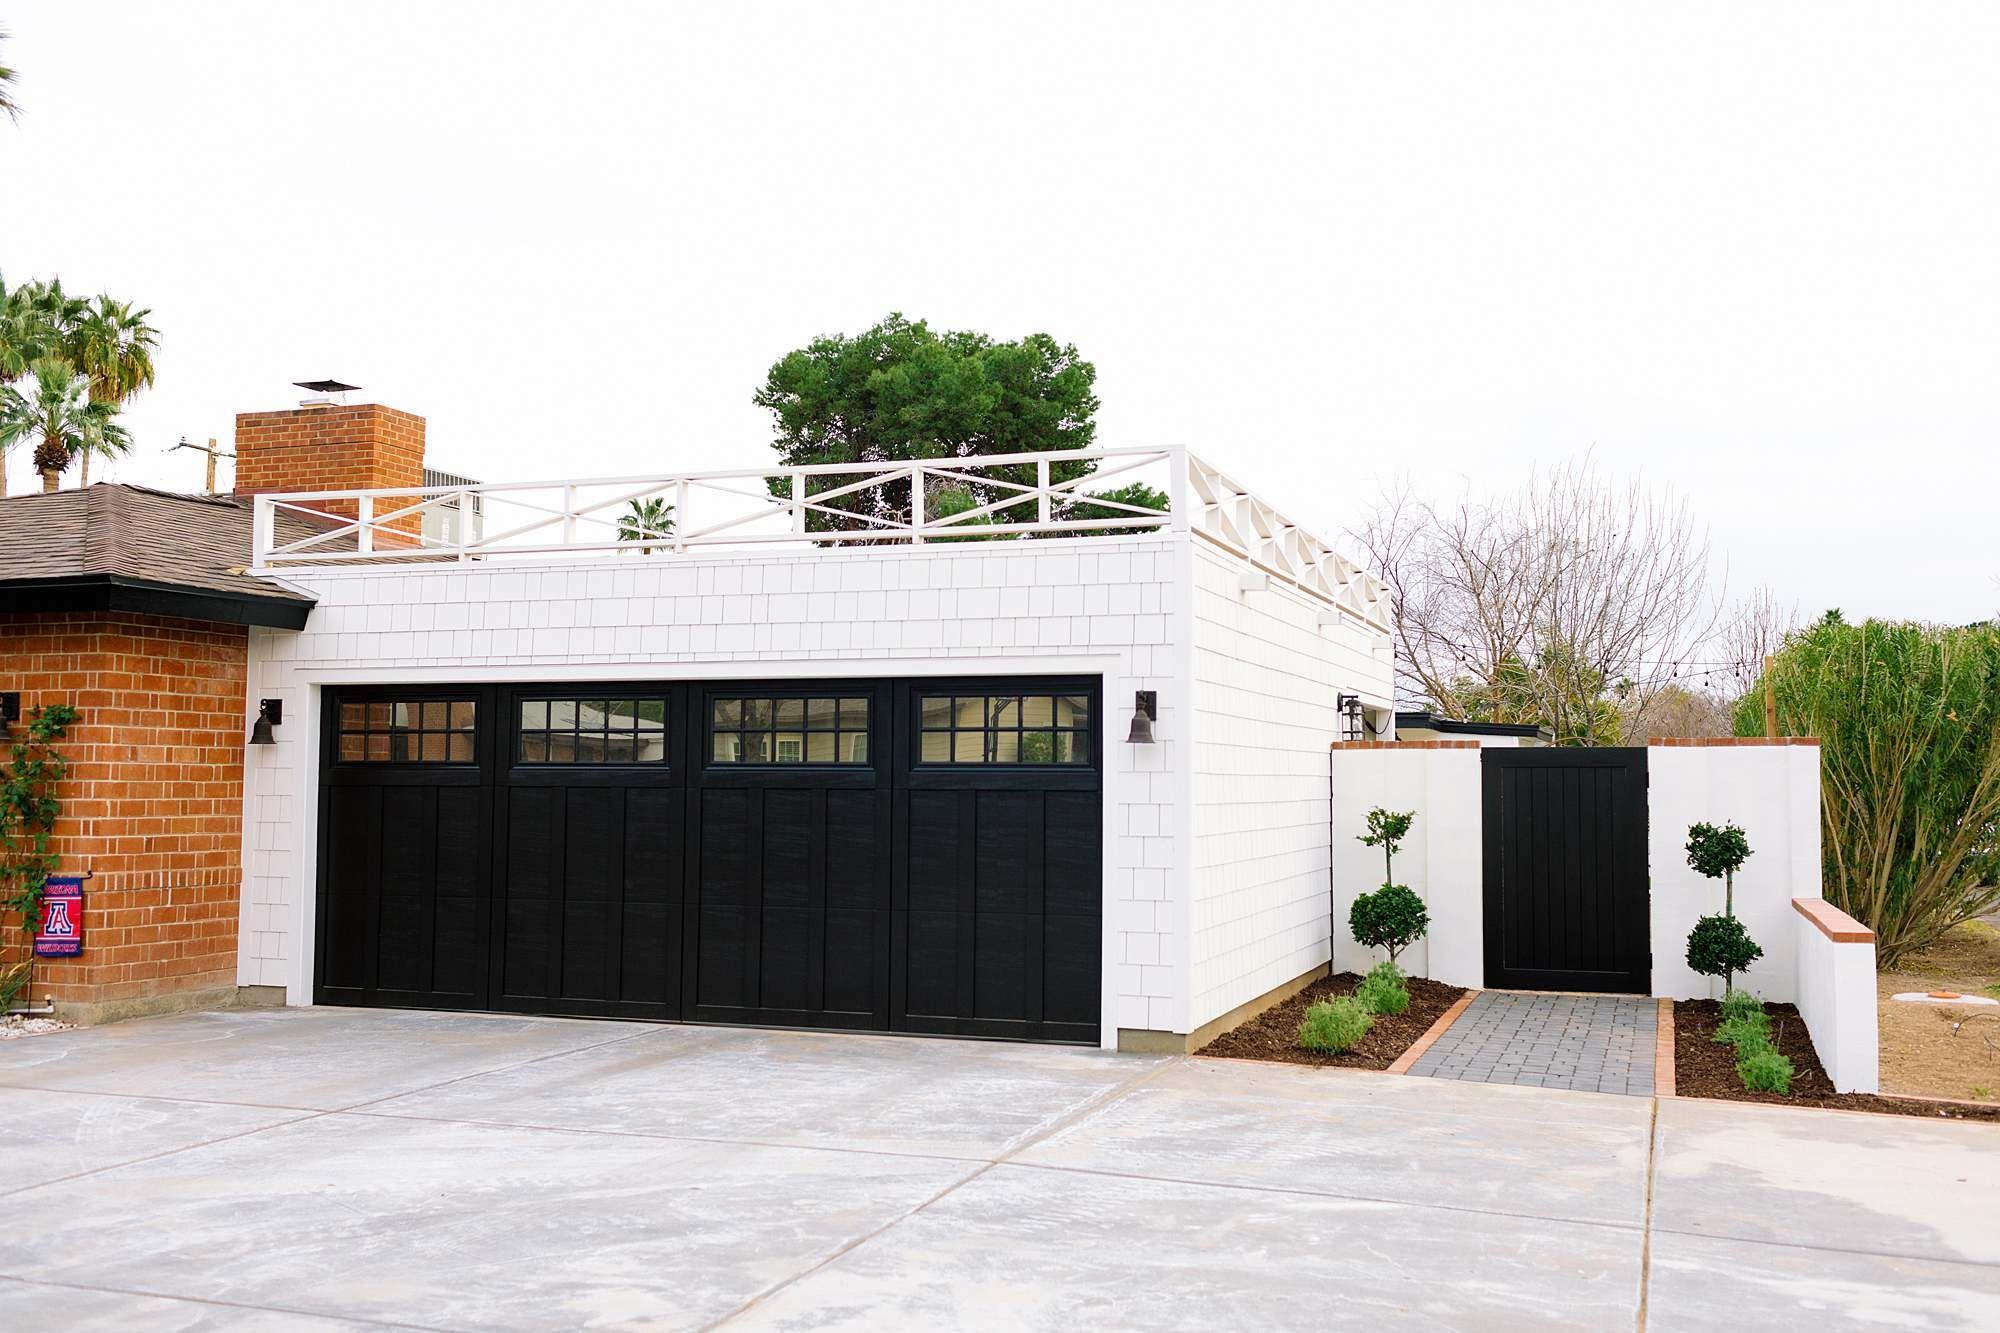 Flat Roof Garage Ideas Designs In 2020 Garage Design Flat Roof House Exterior